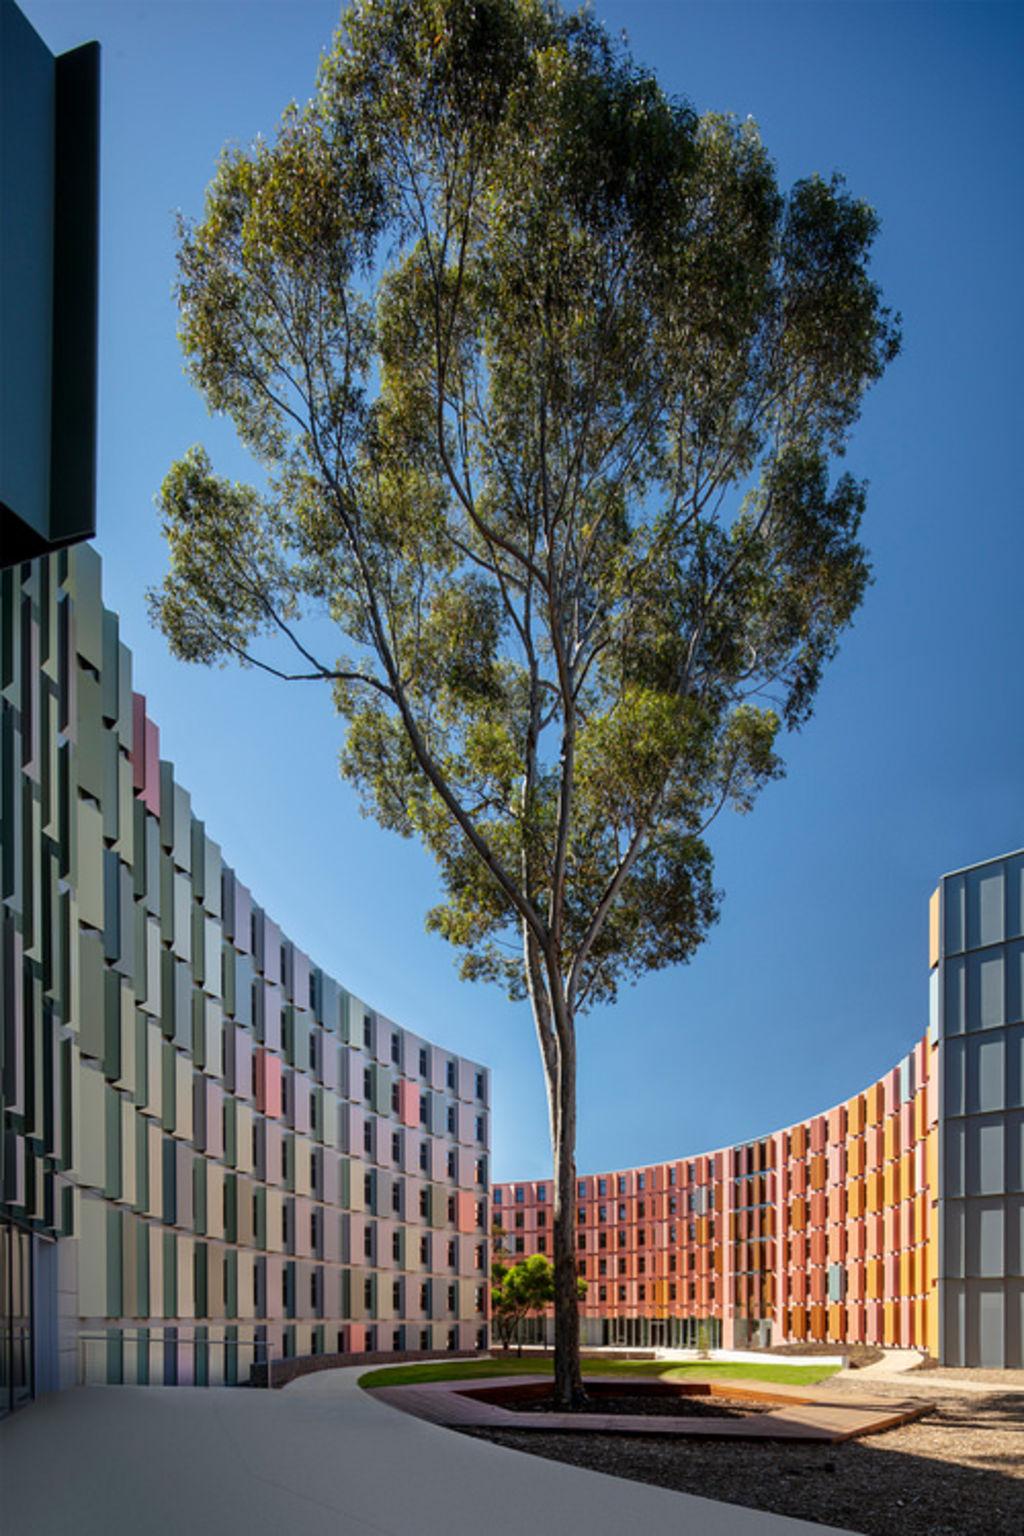 La Trobe University's north and south student accommodation apartments by JCB. Dezeen Awards.